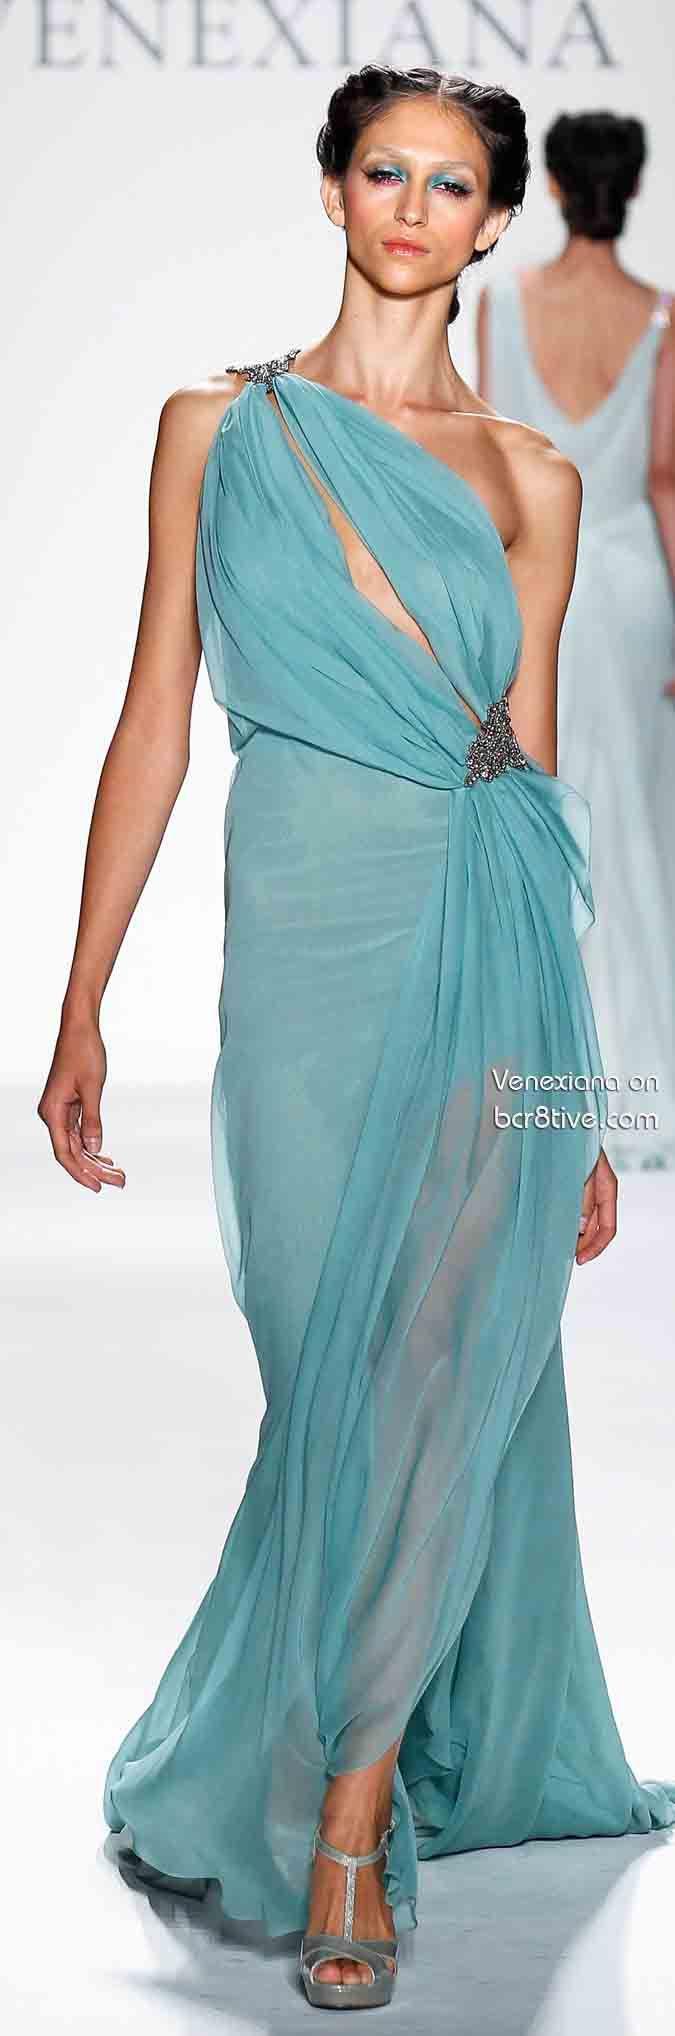 181 best 1 Greek Goddess Wedding images on Pinterest | Wedding ...